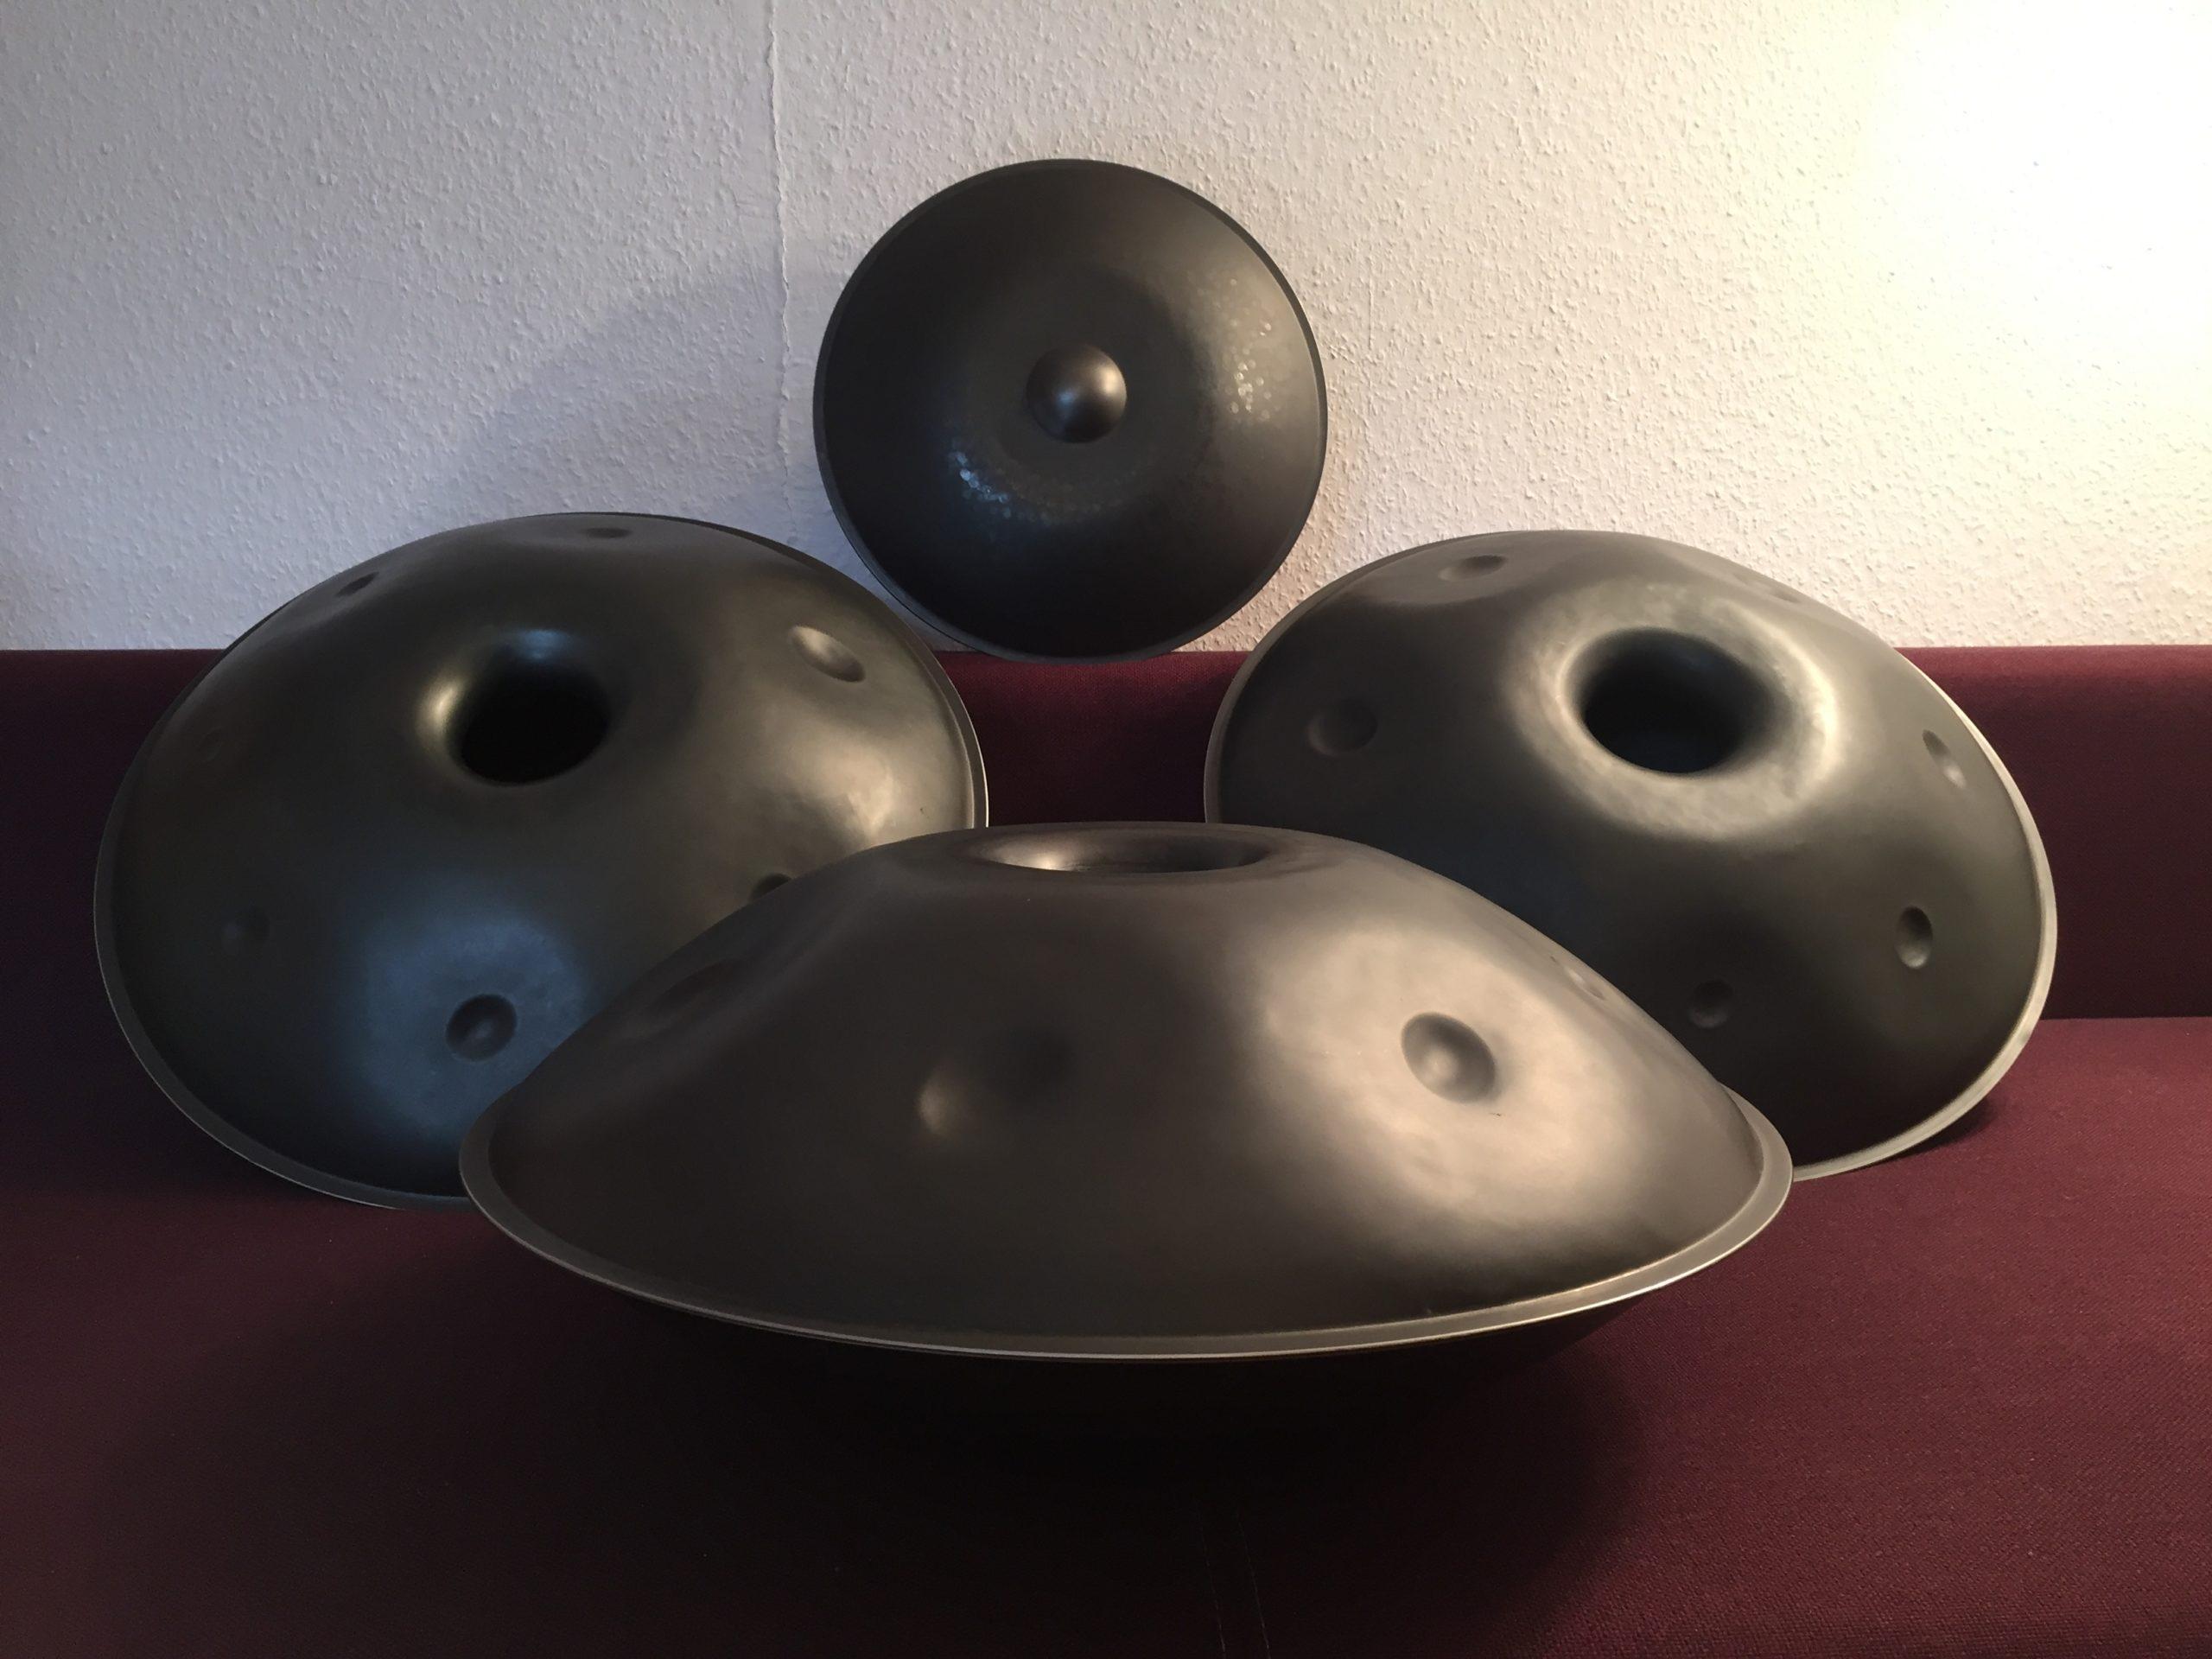 Foto Musikinstrument Hang balu